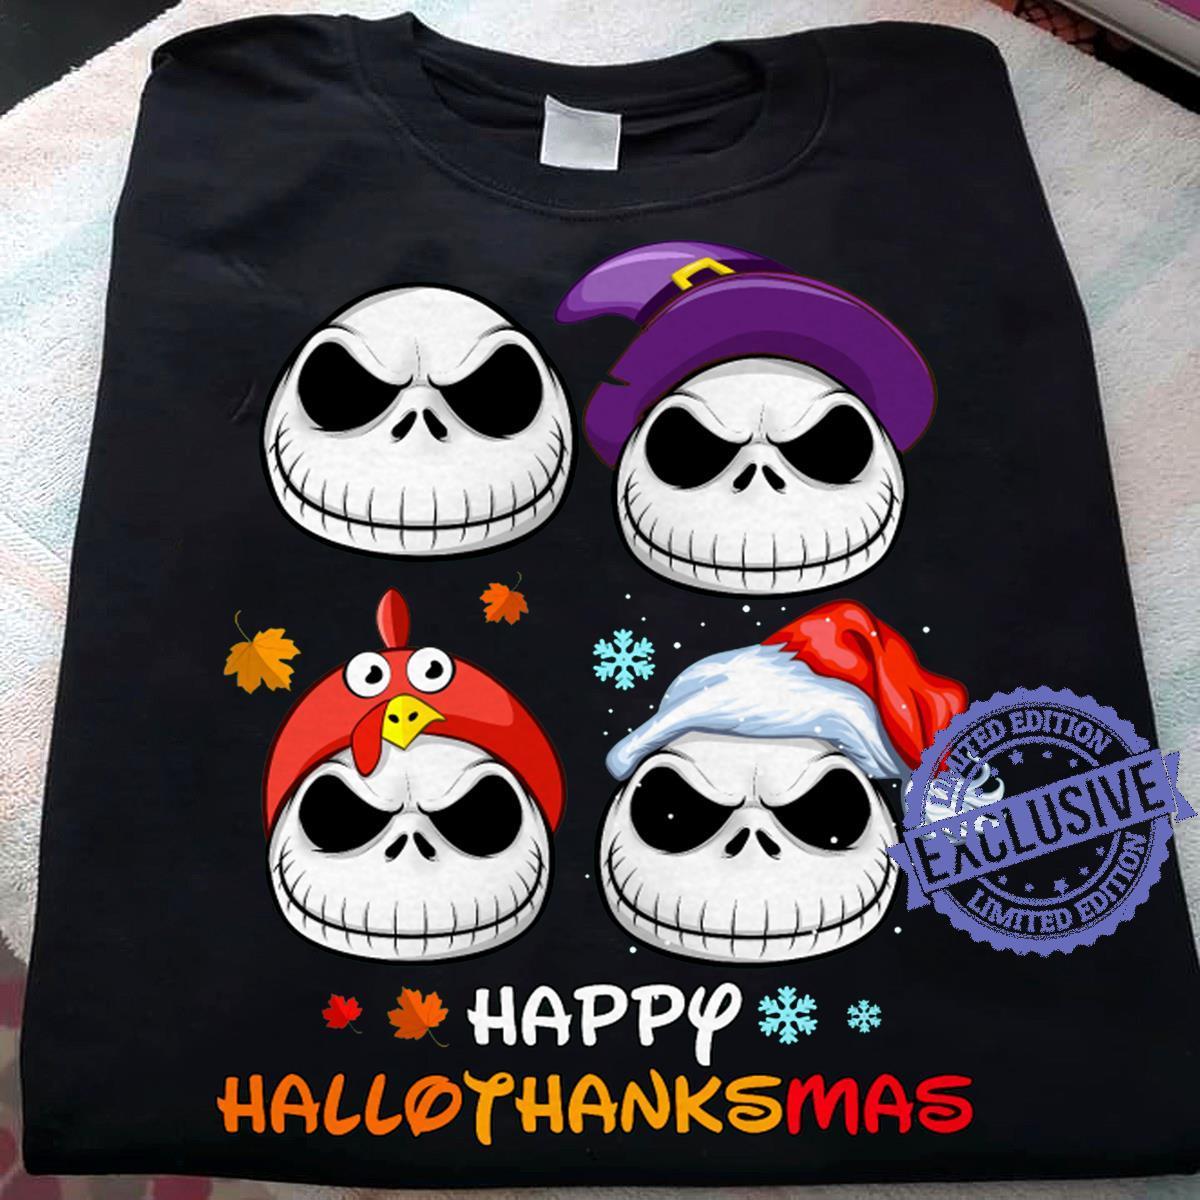 Skellington Happy hallothanksmas shirt